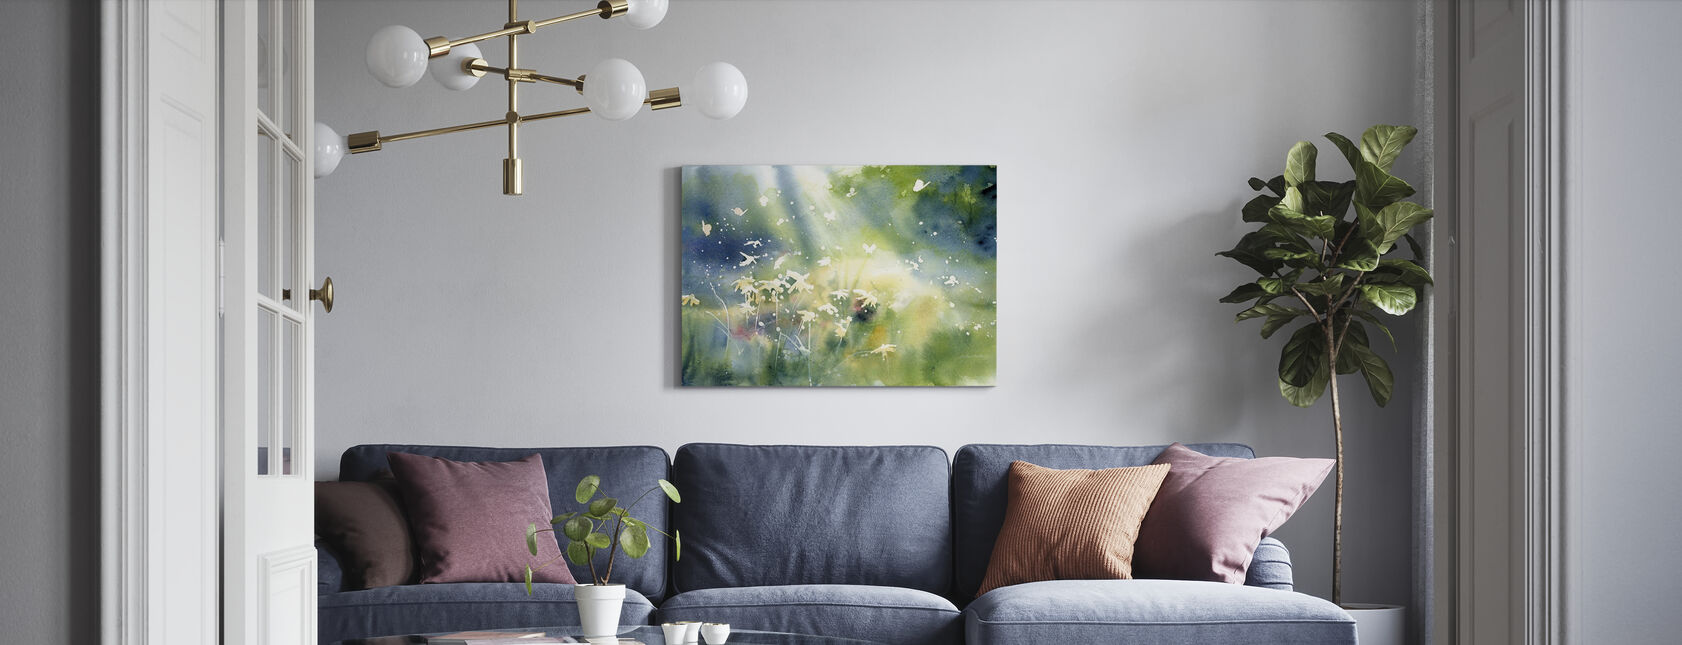 Landskapslys - Lerretsbilde - Stue